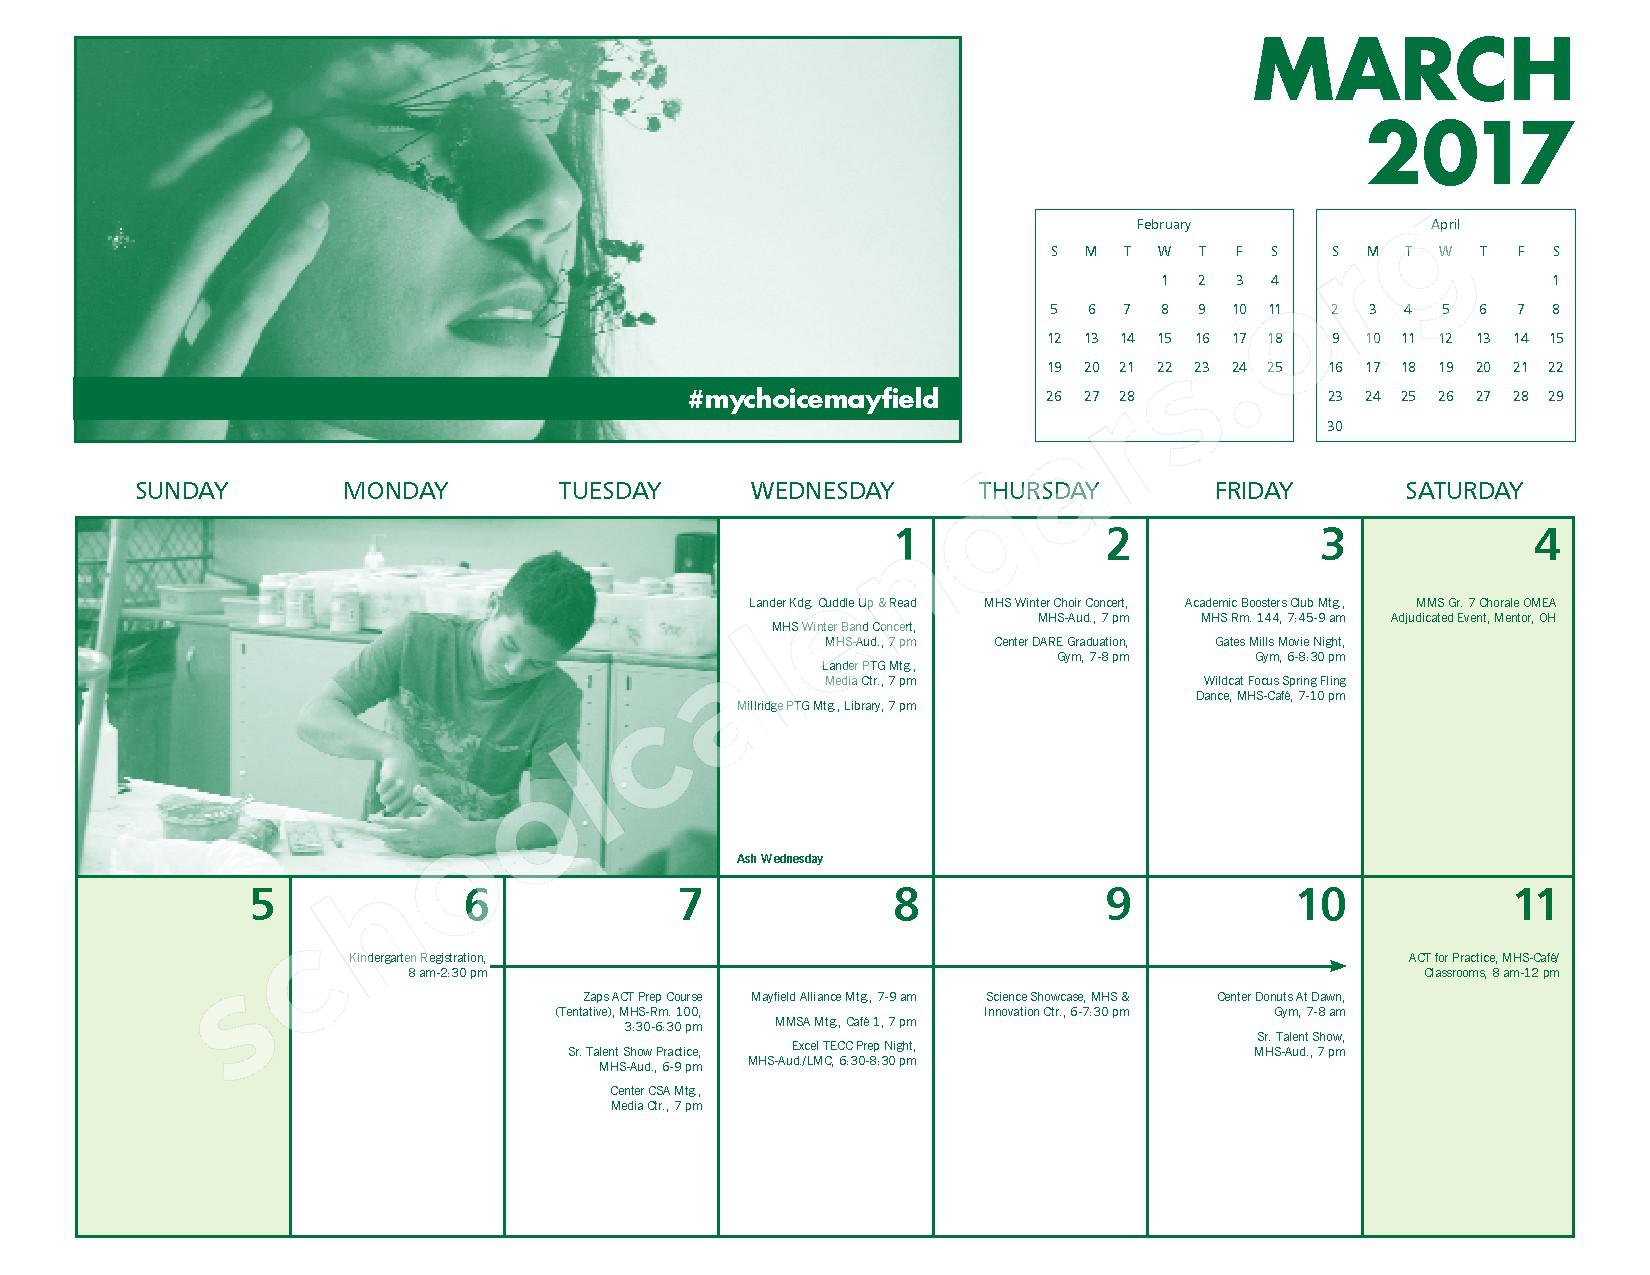 2016 - 2017 Mayfield Activities Calendar – Mayfield City Schools – page 20